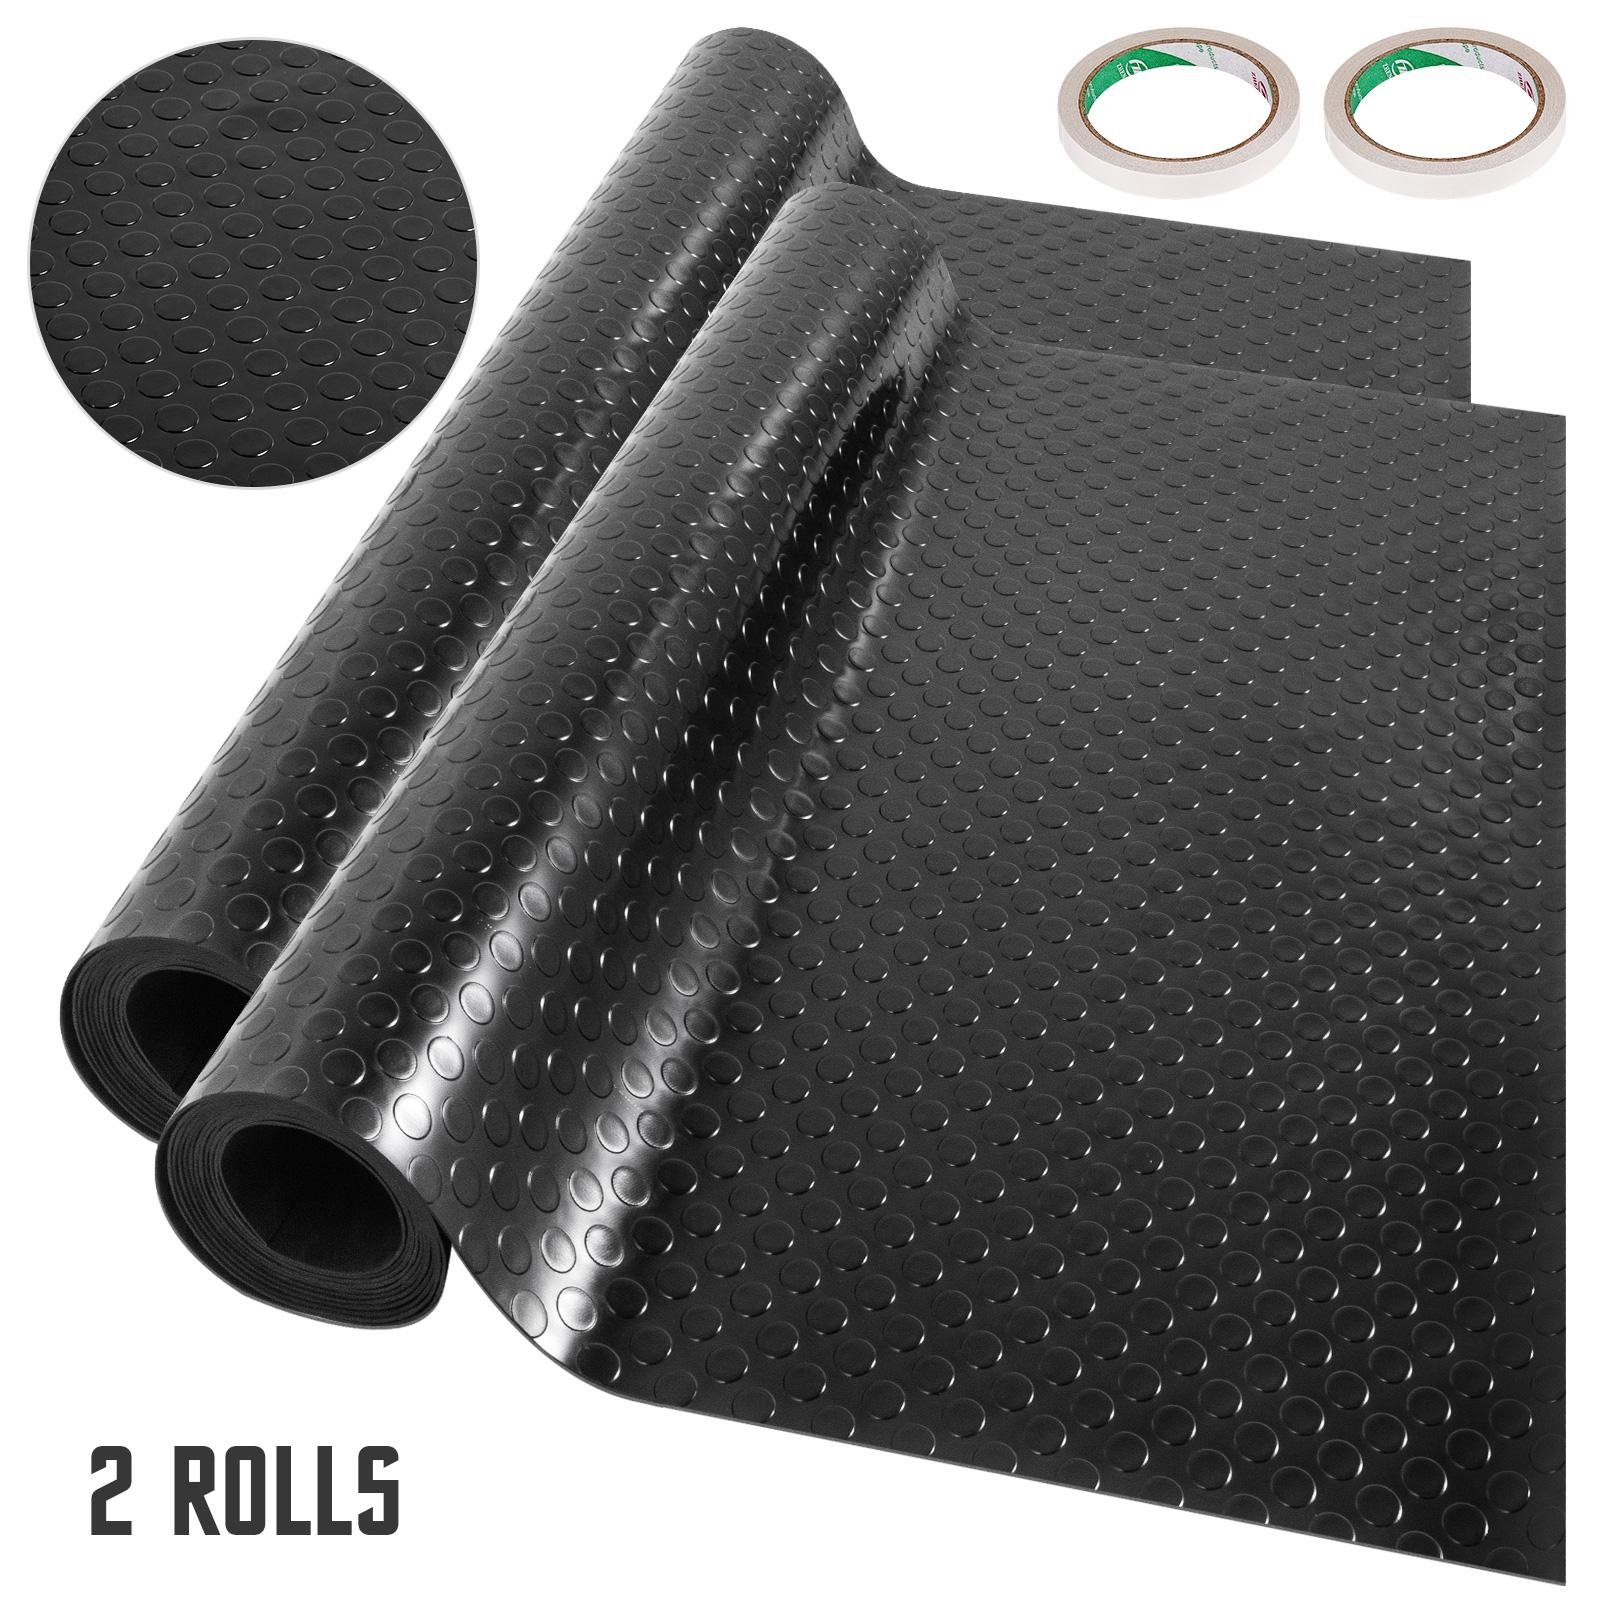 thumbnail 145 - Garage Flooring Mat Roll Car Trailer Floor Covering 1.1m Width Gym Floor Roll